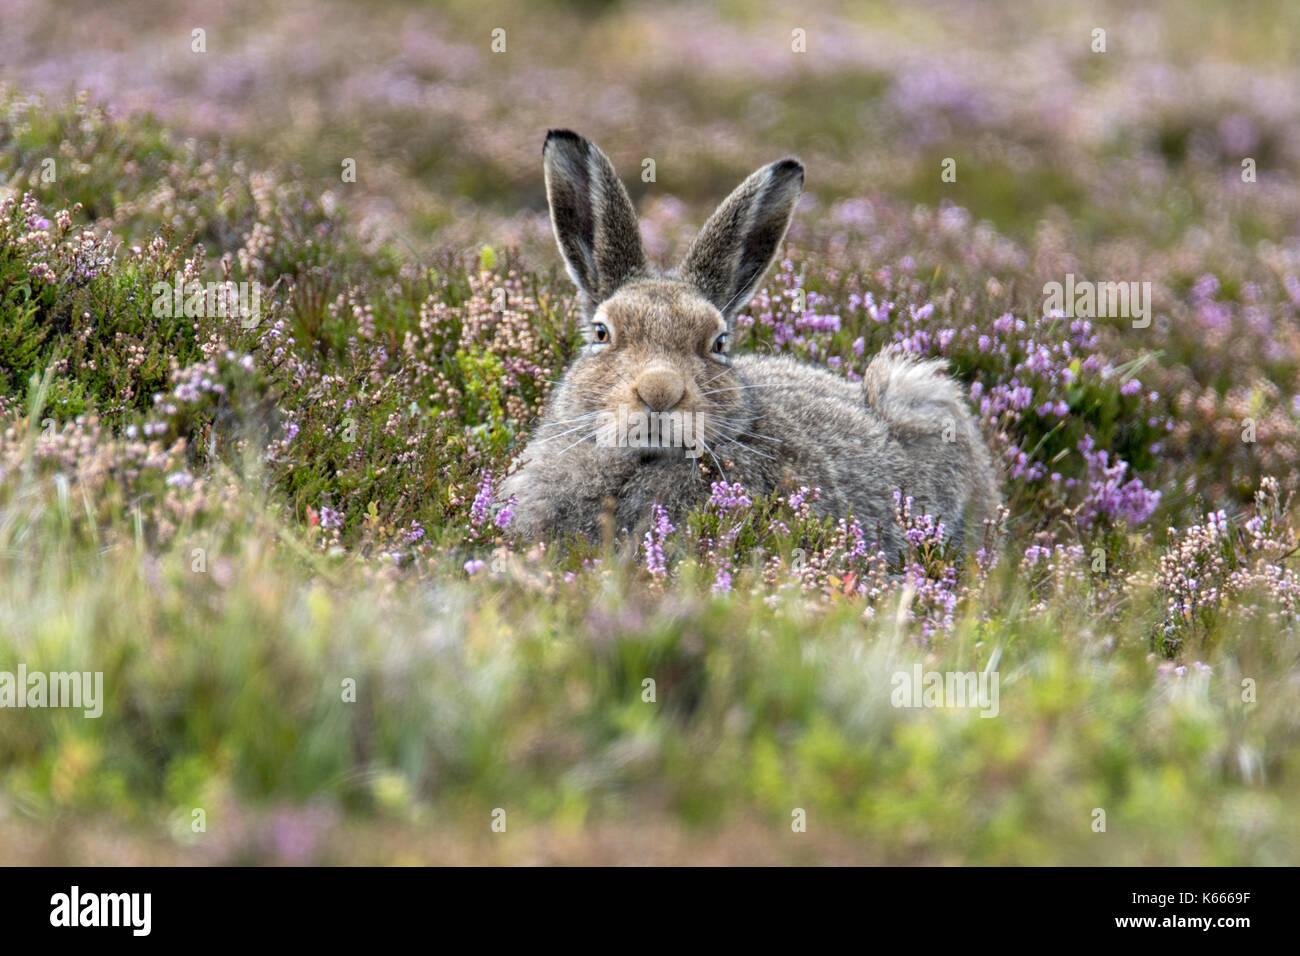 Mountain Hare (Lepus Timidus), Scottish Highlands, August 2017 - Stock Image